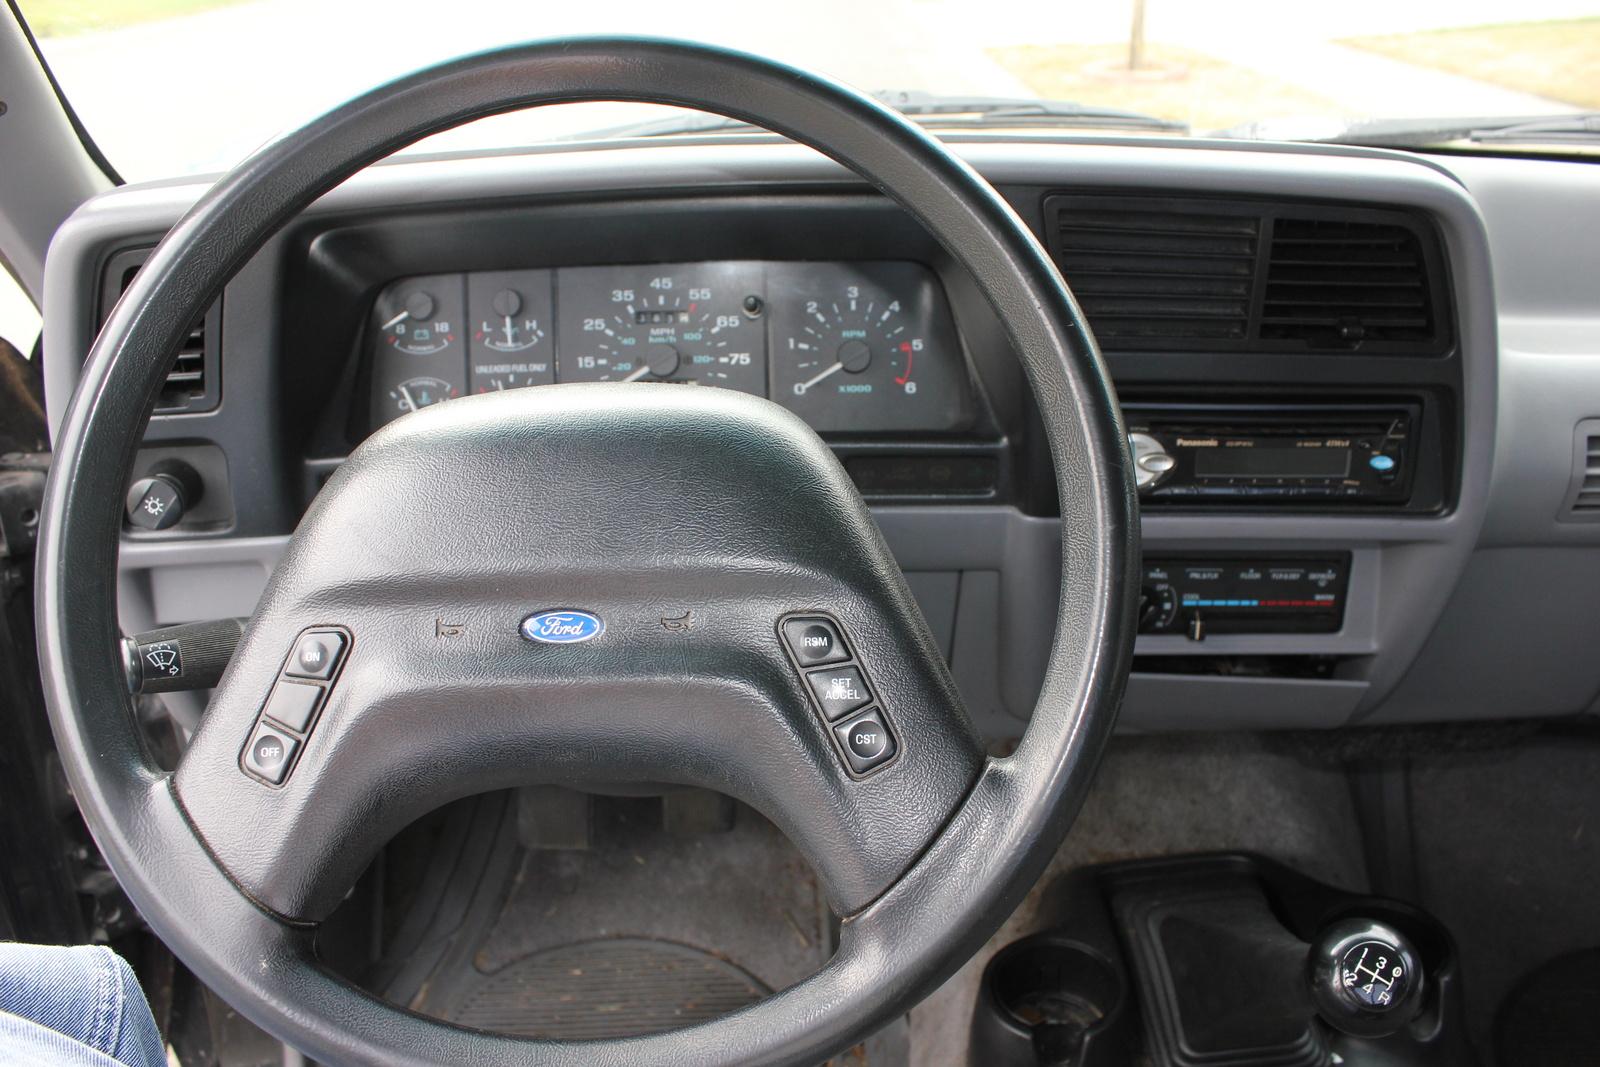 1994 Ford Ranger Splash Standard Cab Stepside SB, Picture of 1994 Ford Ranger 2 Dr Splash Standard Cab Stepside SB, interior